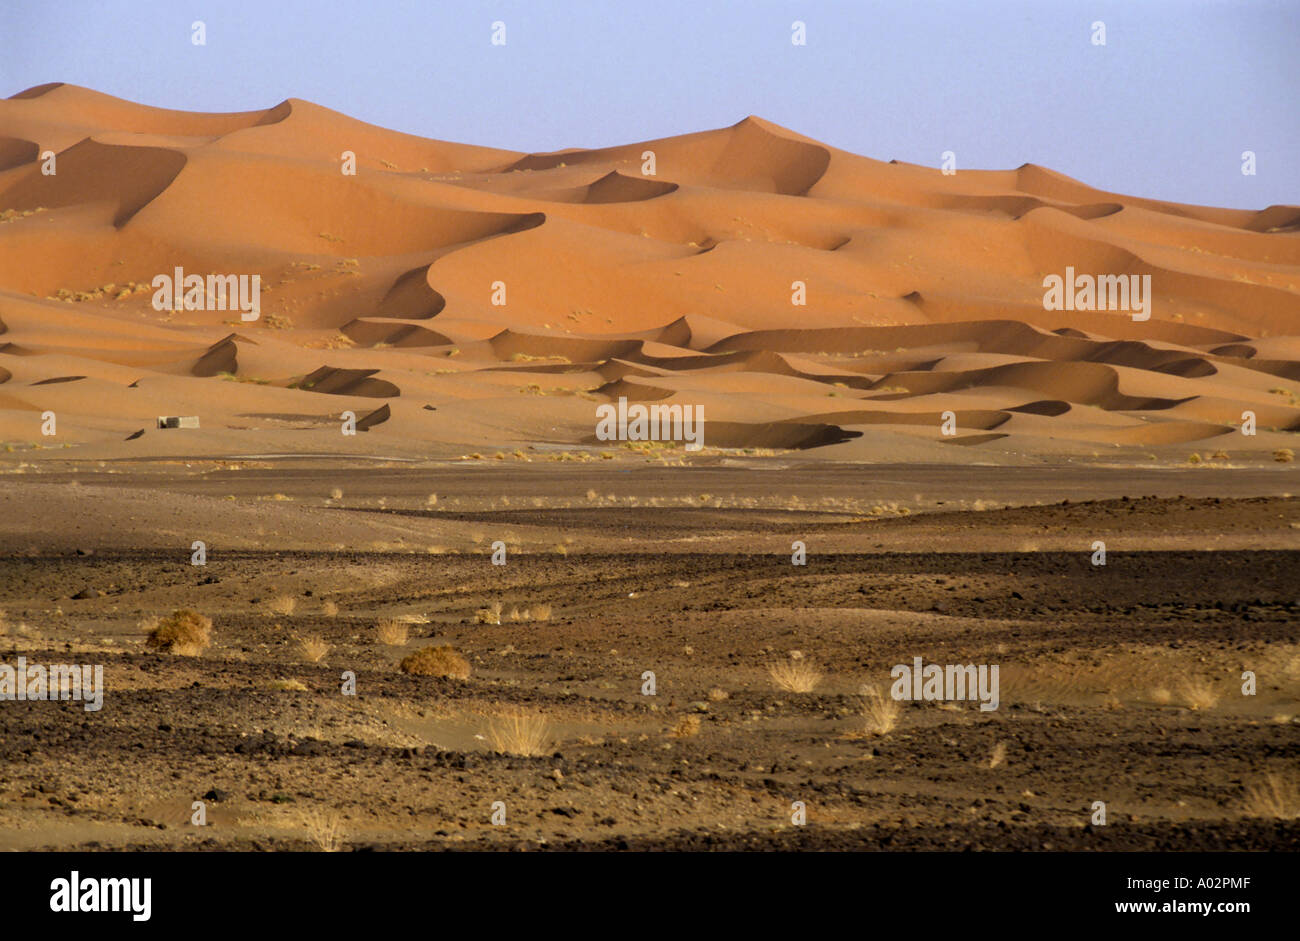 Sahara desert sand dunes, Erg Chebbi, Morocco. - Stock Image